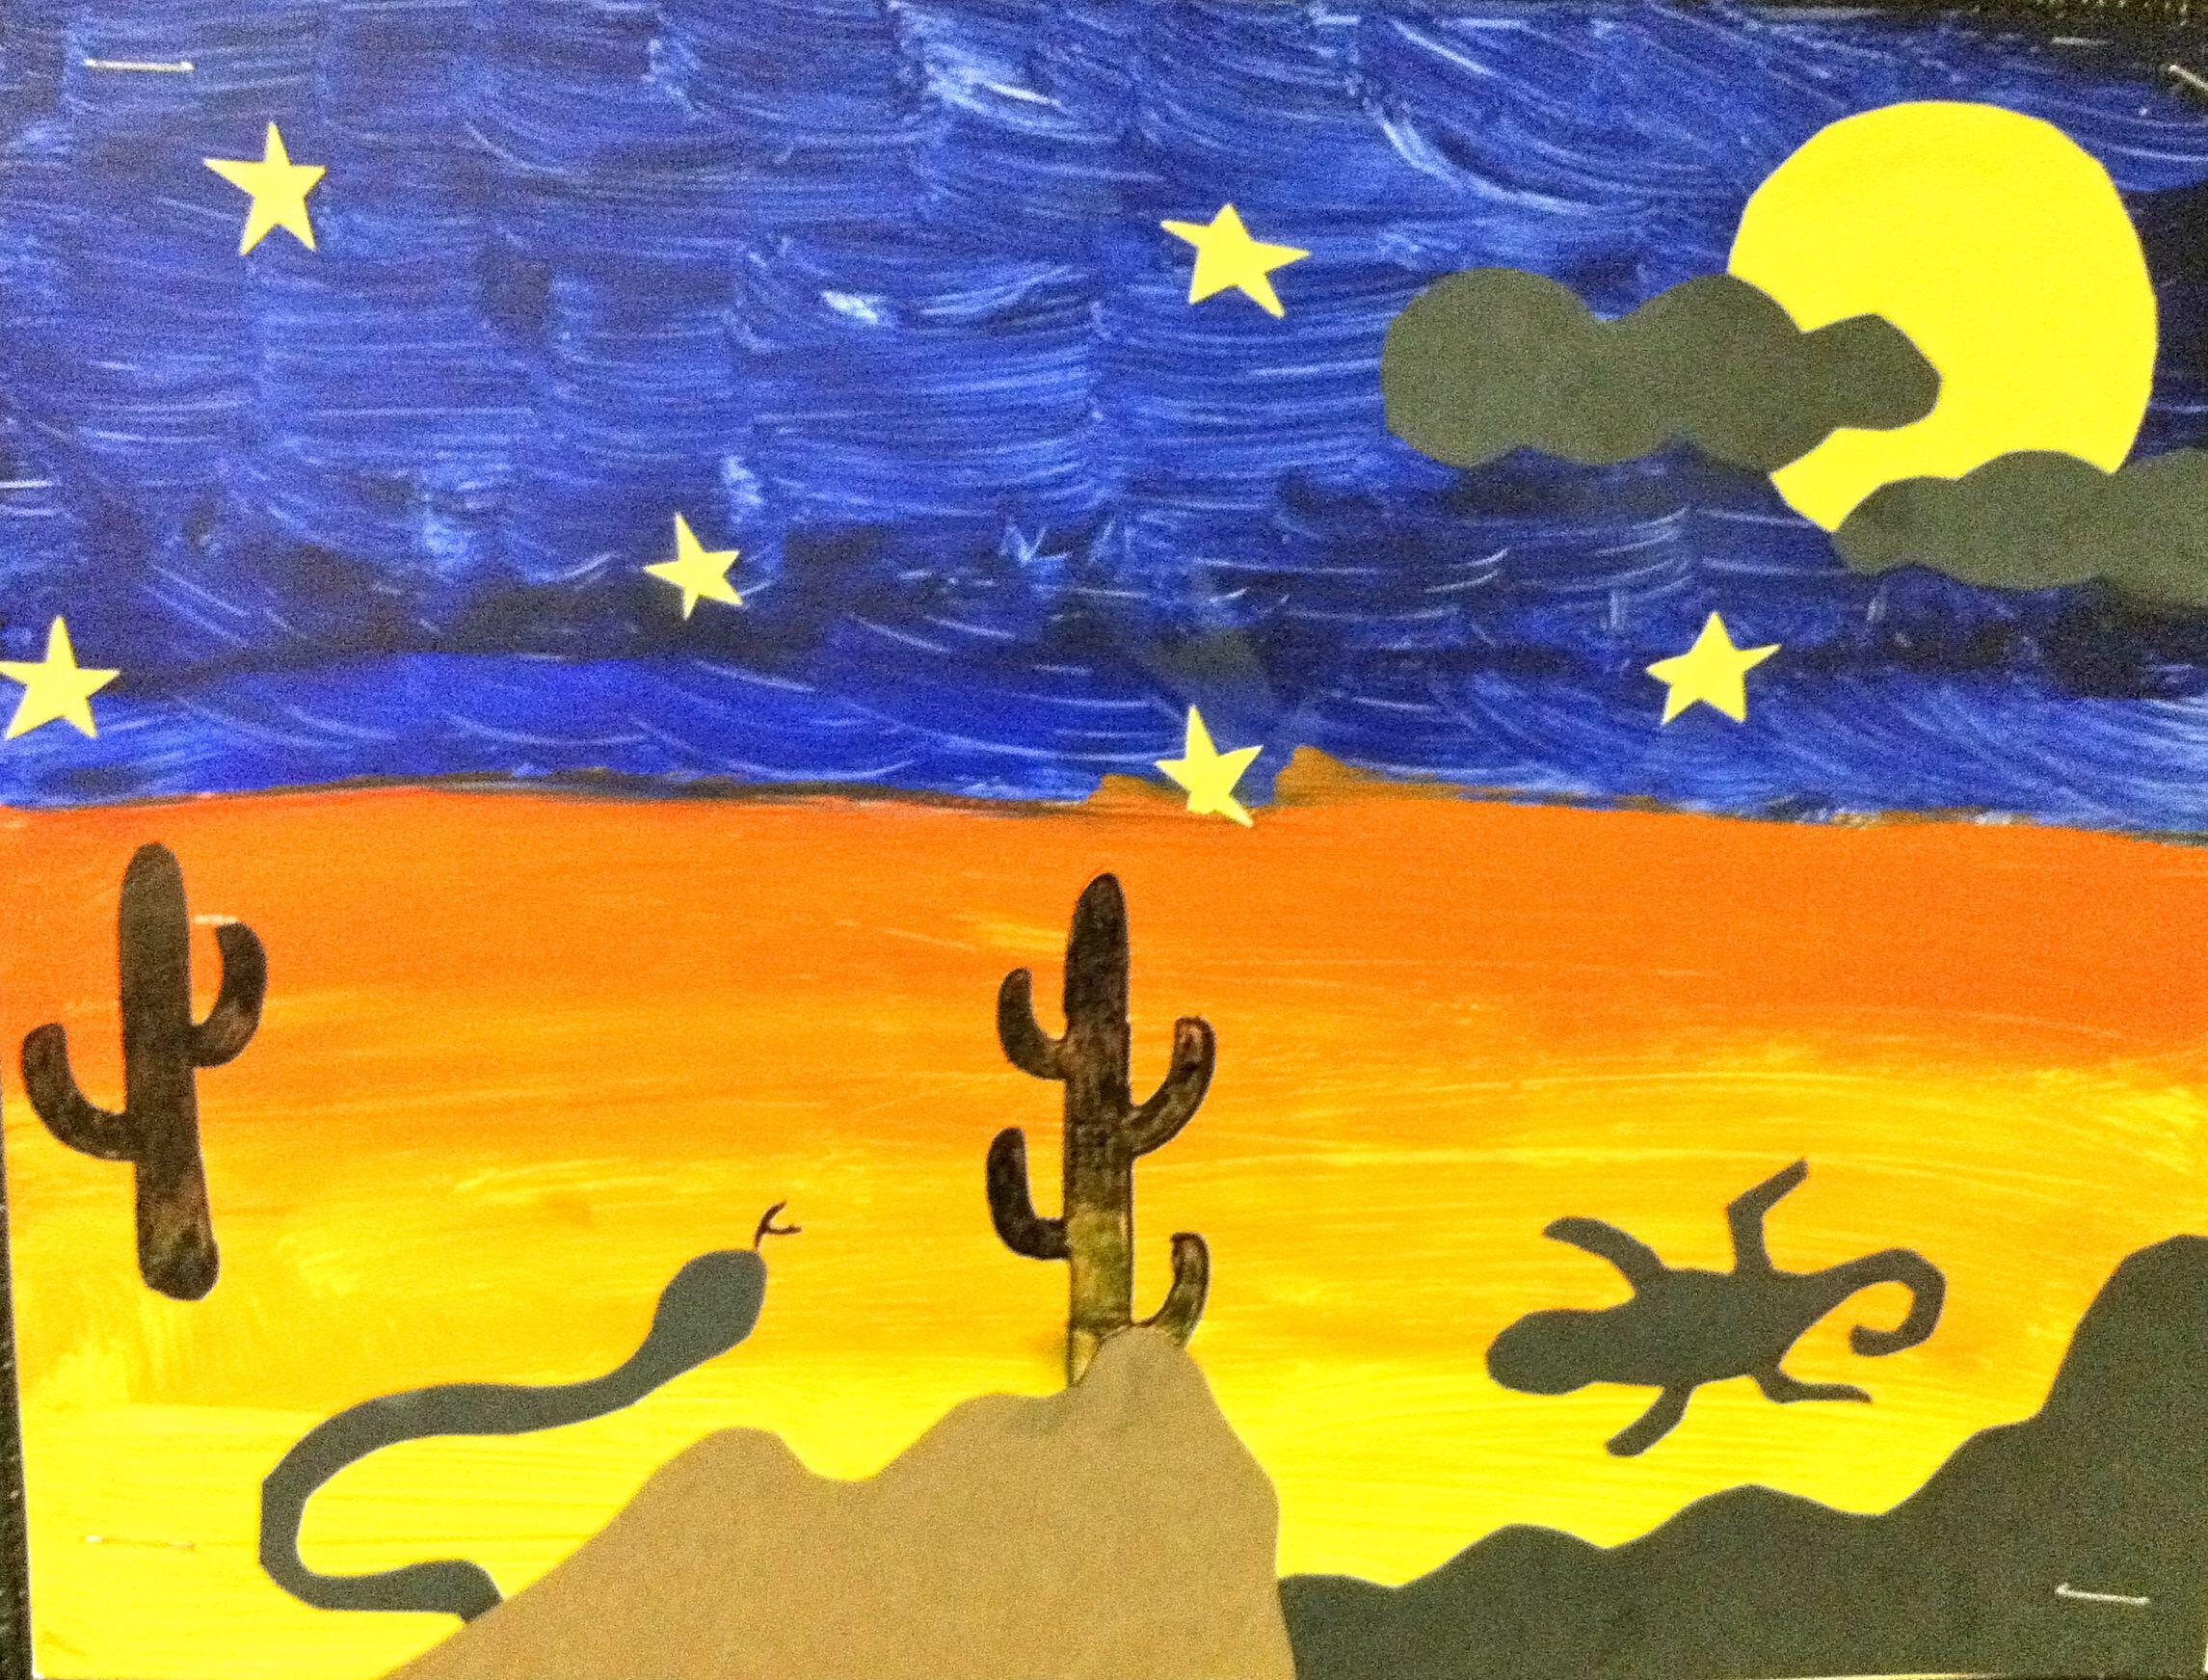 Desert bulletin board ideas verano divertido pinterest